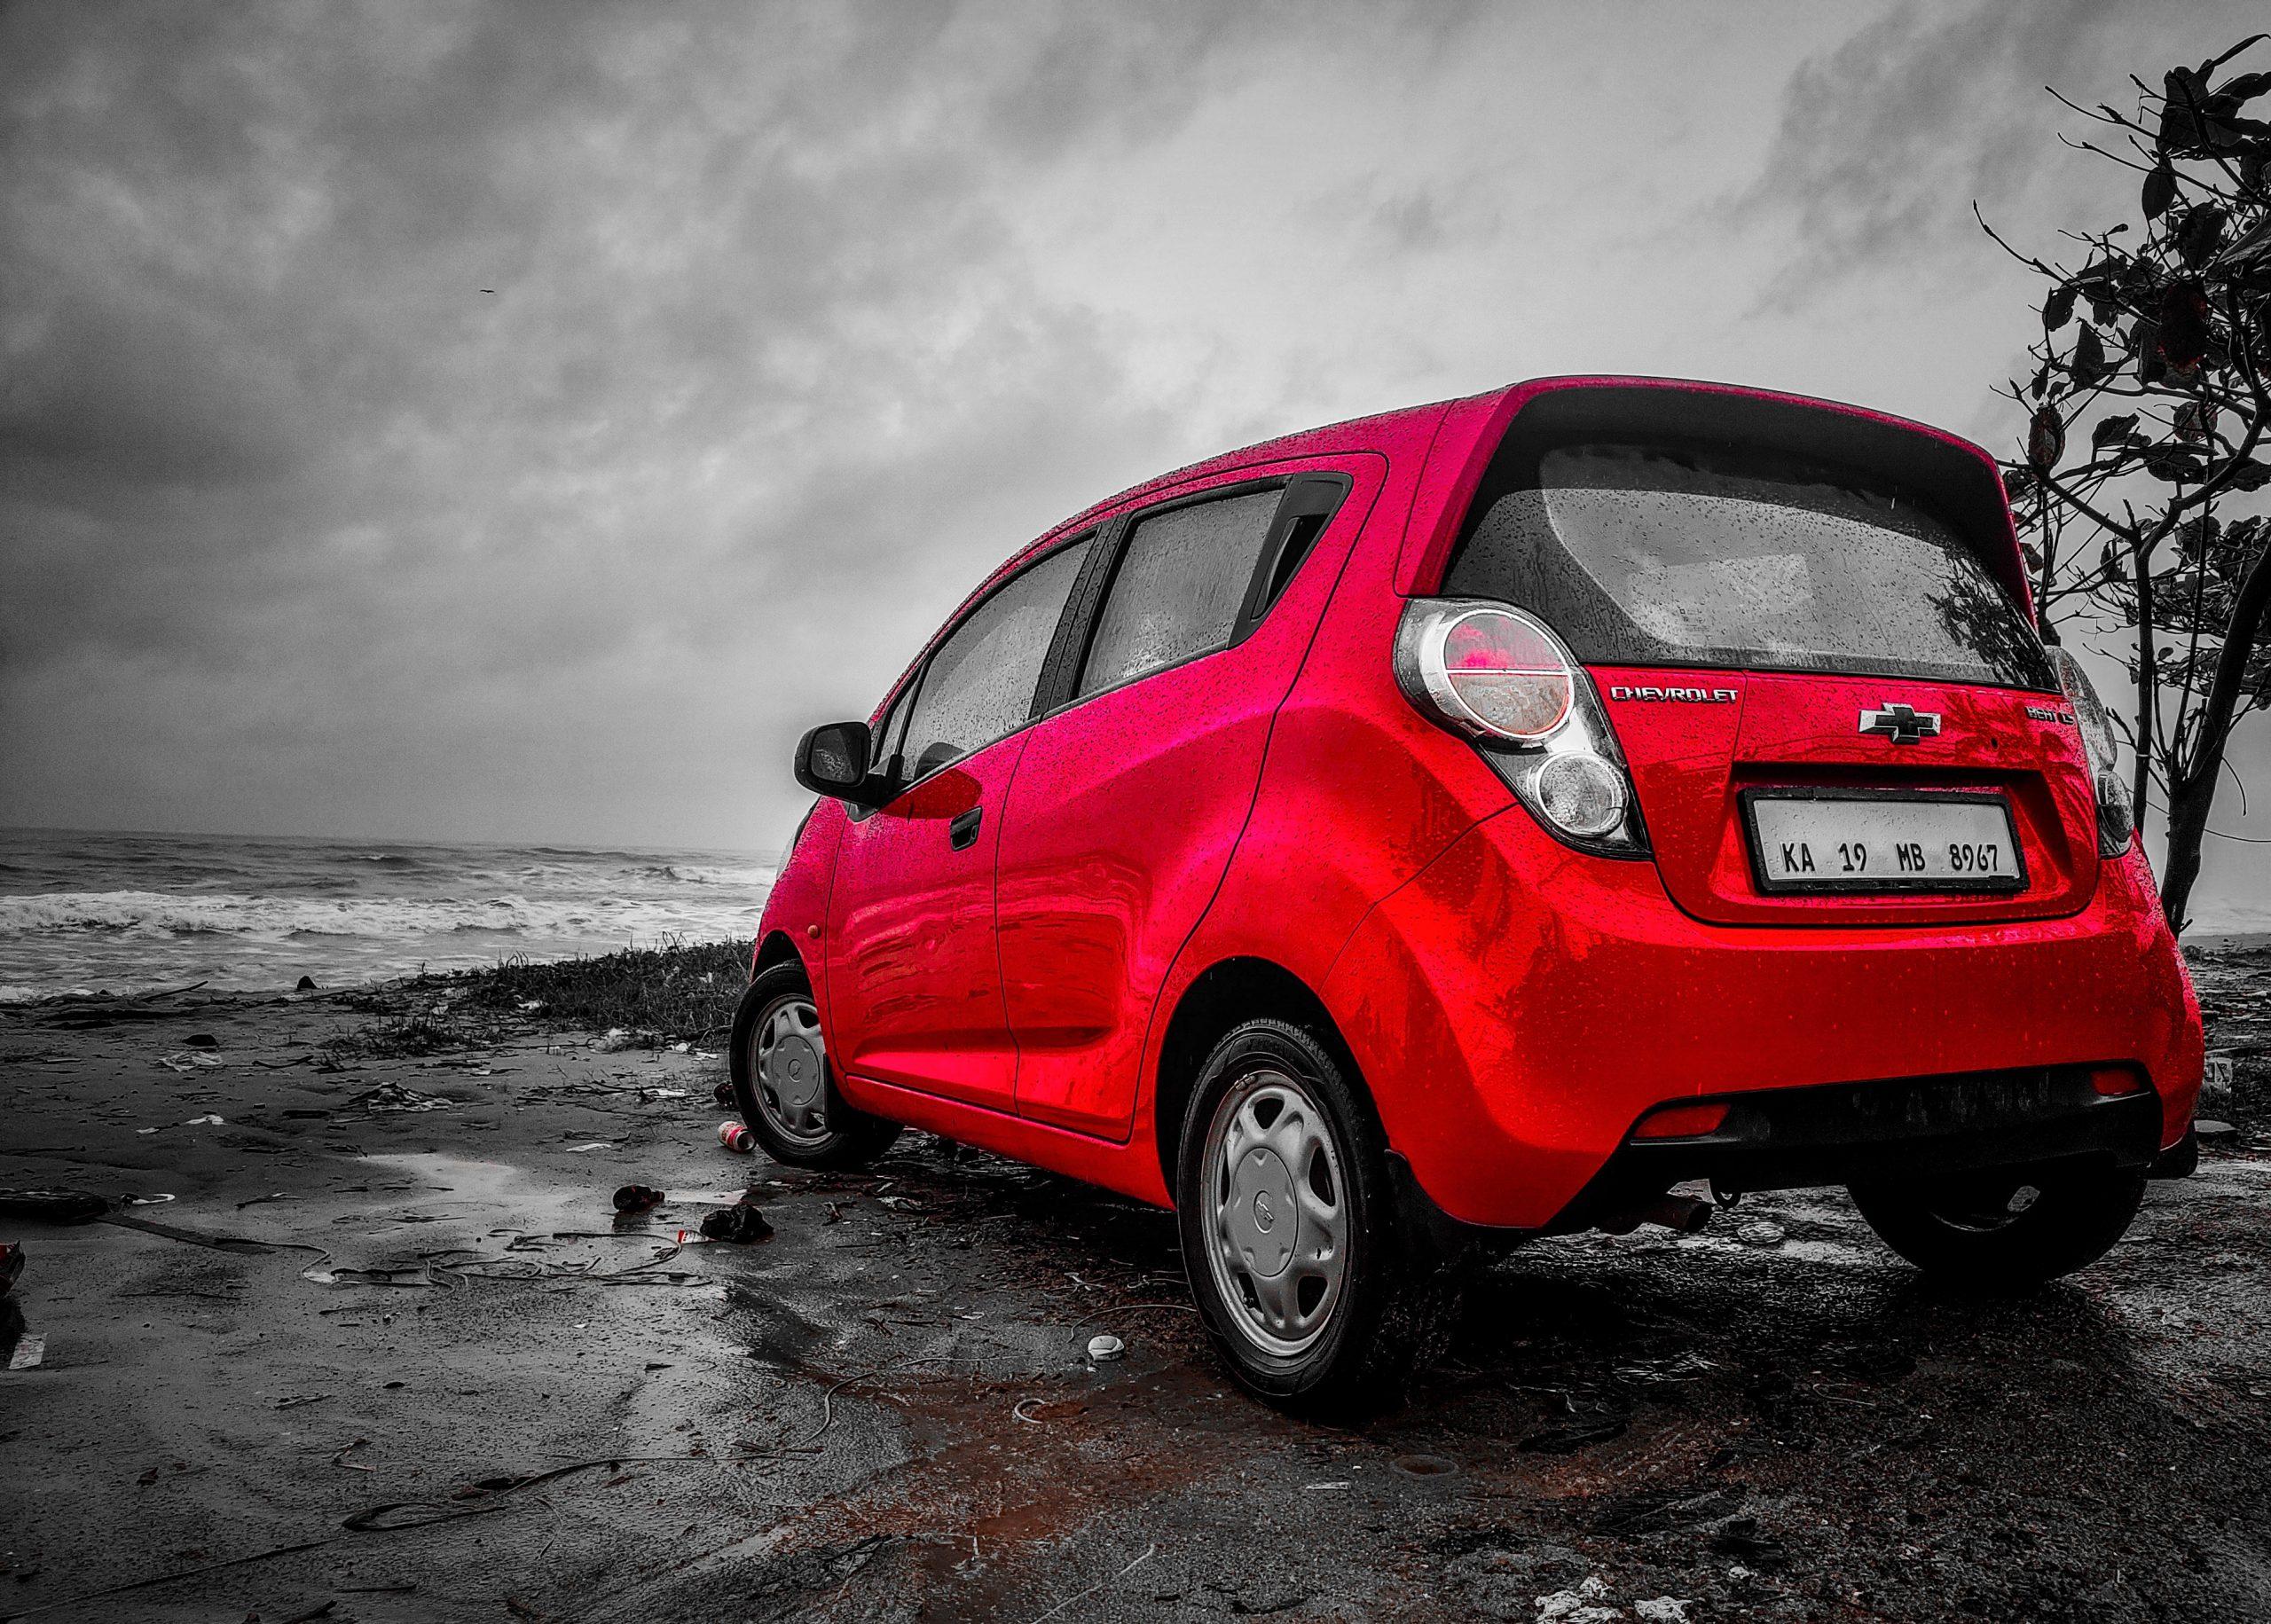 A red car beside a sea